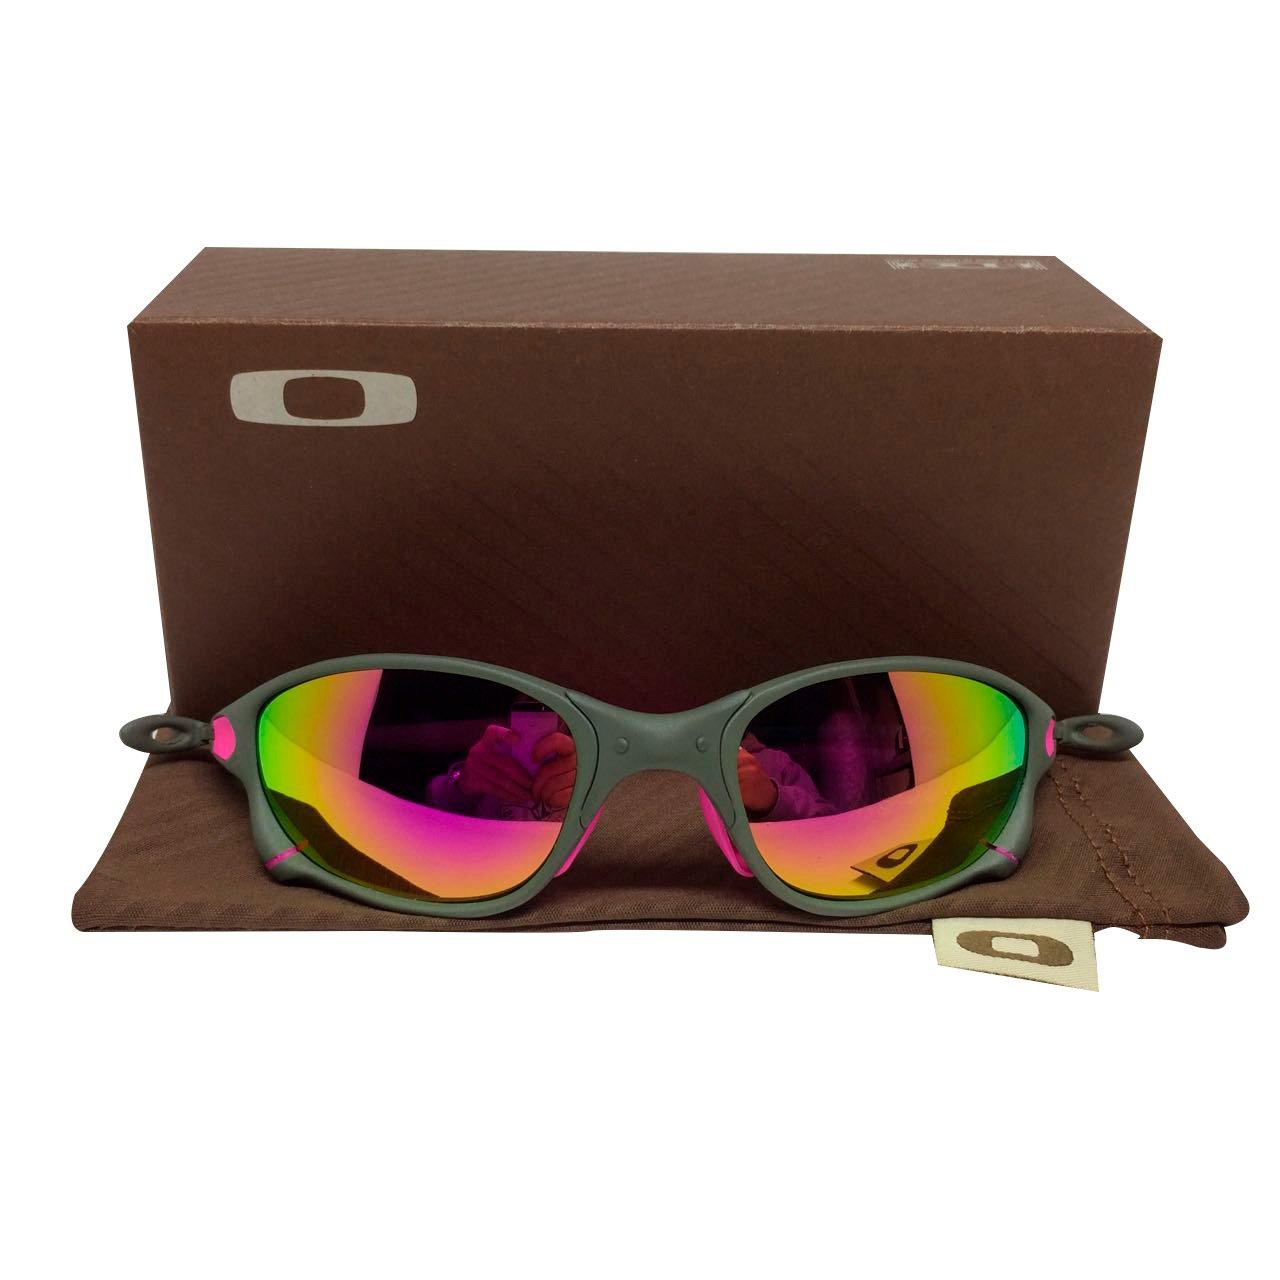 28d02de6f Óculos Oakley Juliet Doublexx Xmetal rosa – Sanfer Acessórios